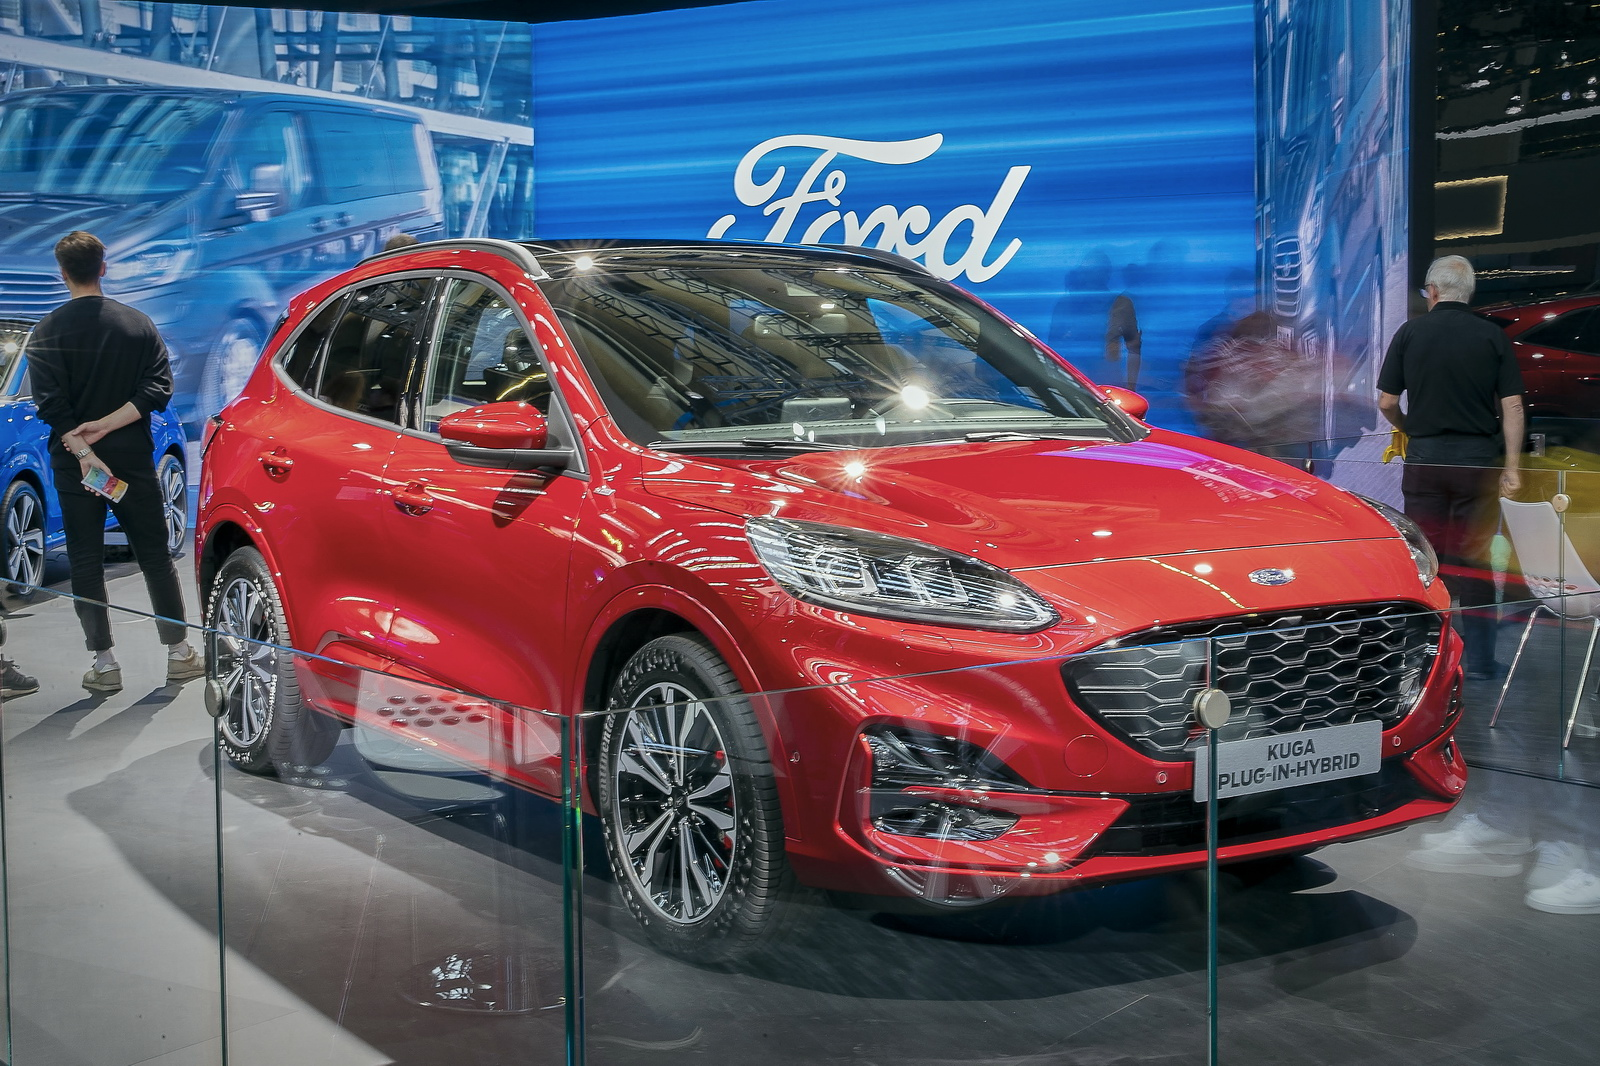 Video La Nuova Ford Kuga E Mild Hybrid Plug In Hybrid E Hybrid